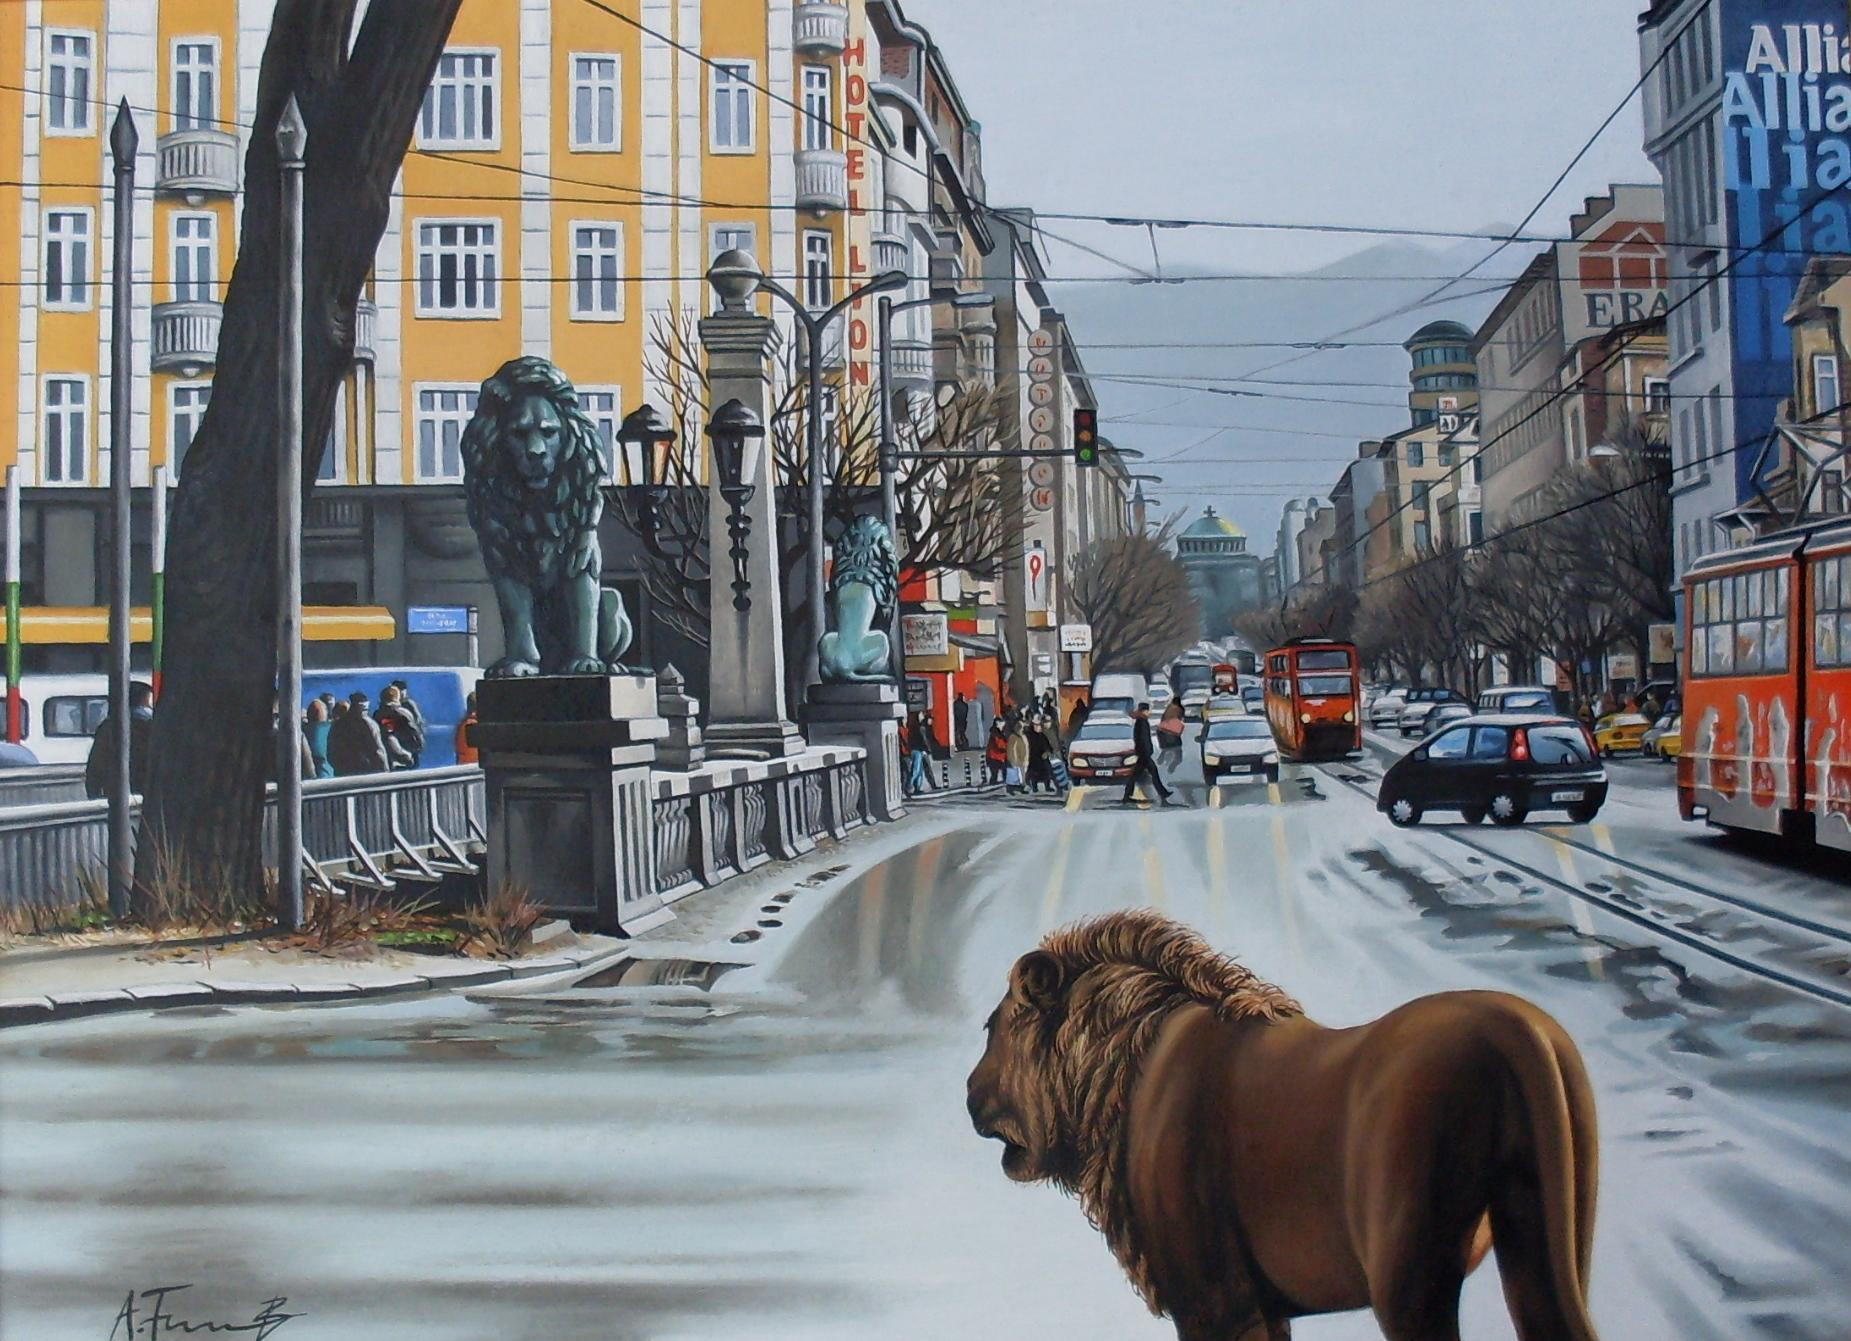 Lions' Bridge, Sofia